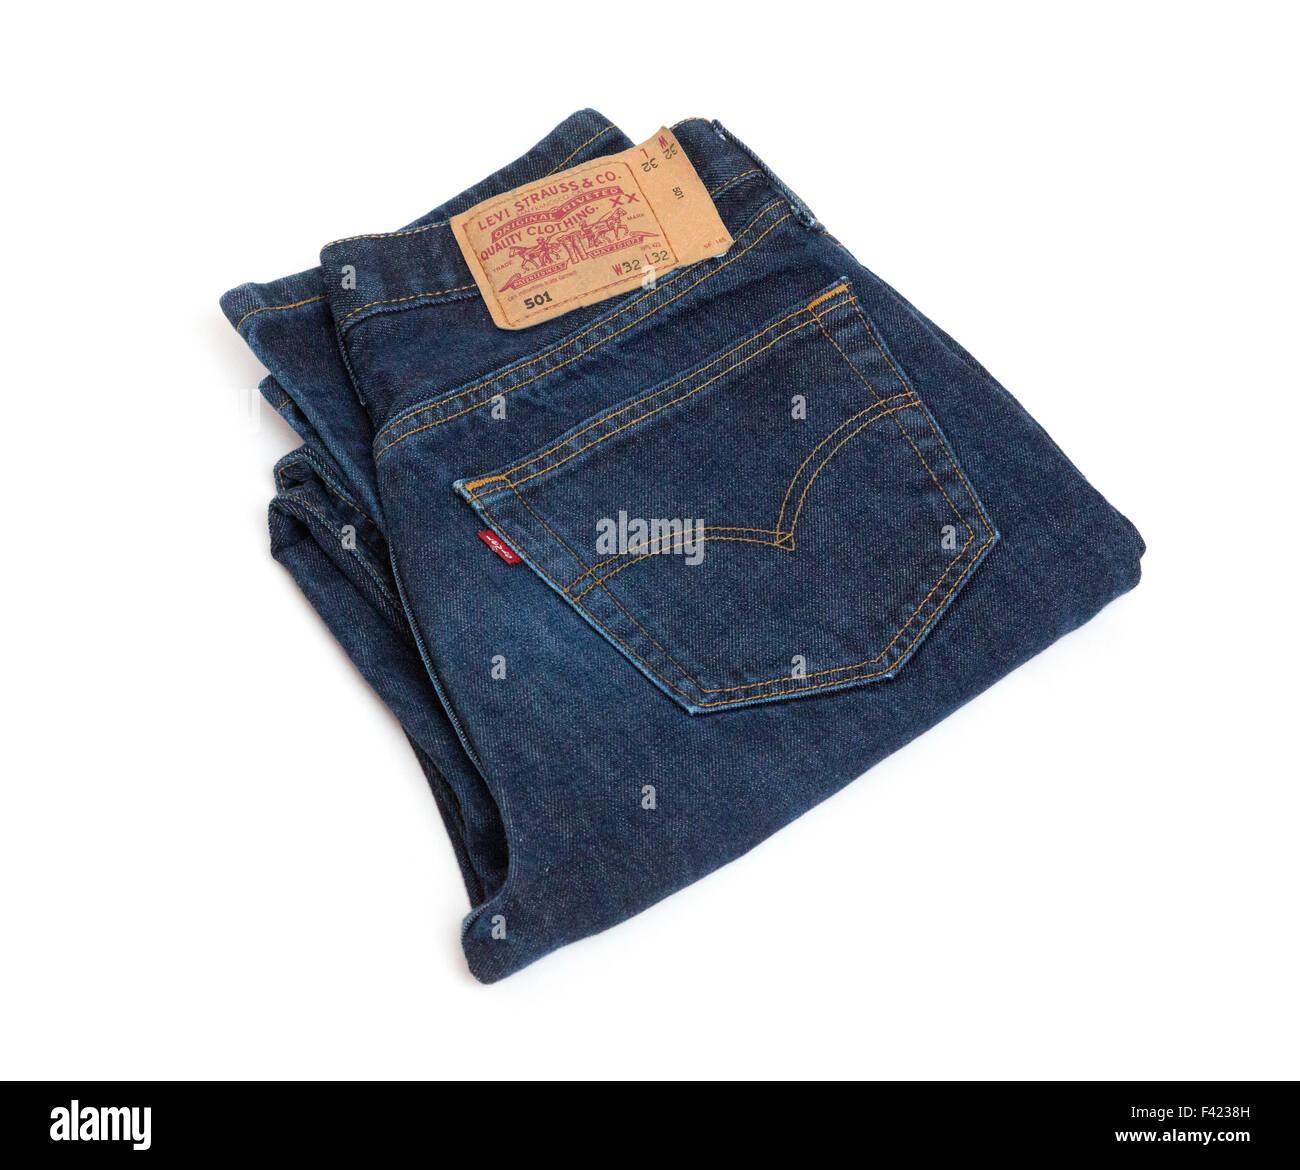 Levi 501 classic denim jeans - Stock Image